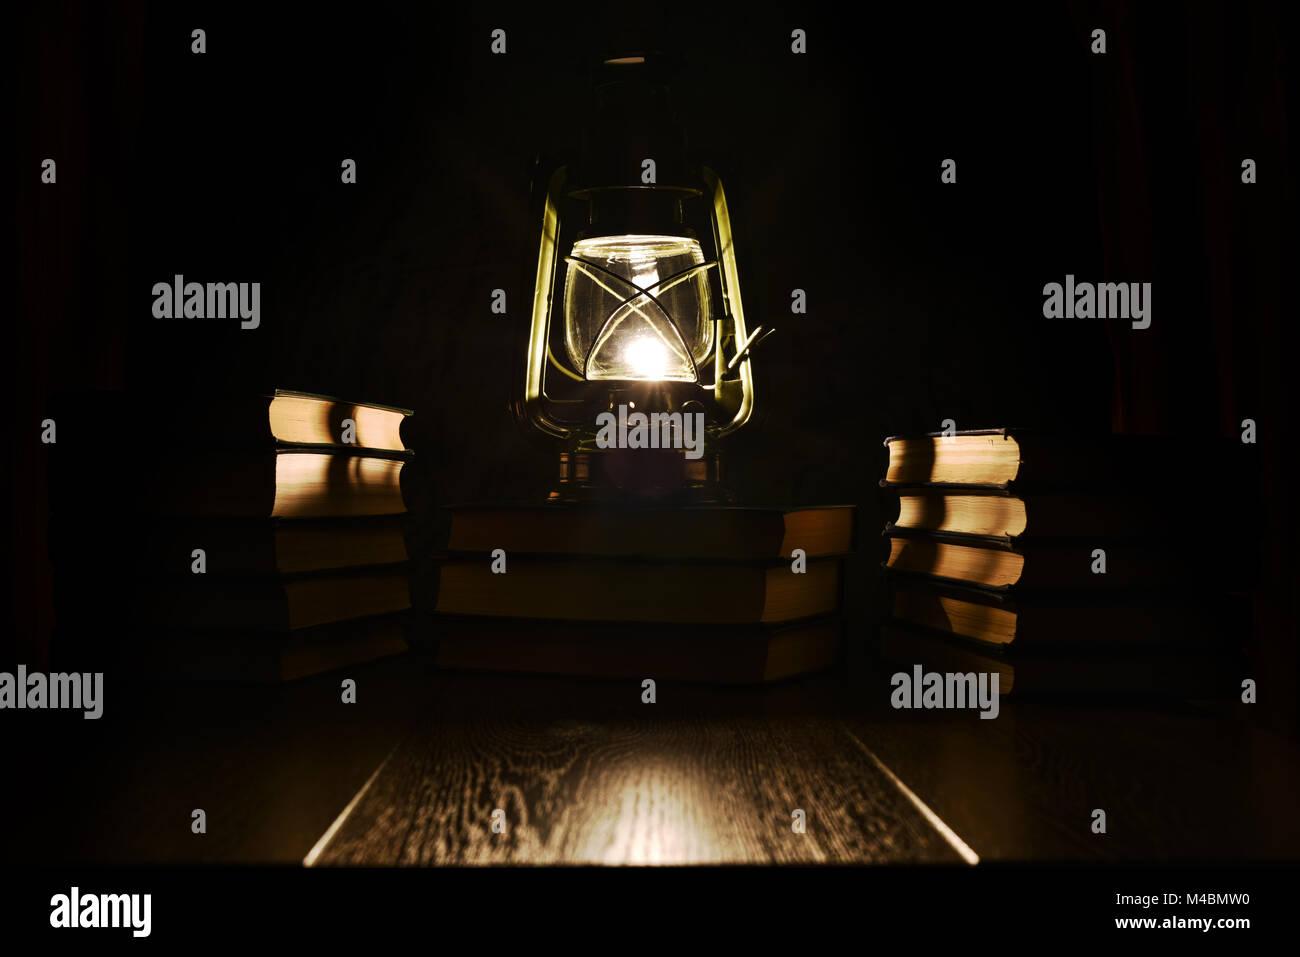 The light of kerosene lamp and books on the table - Stock Image